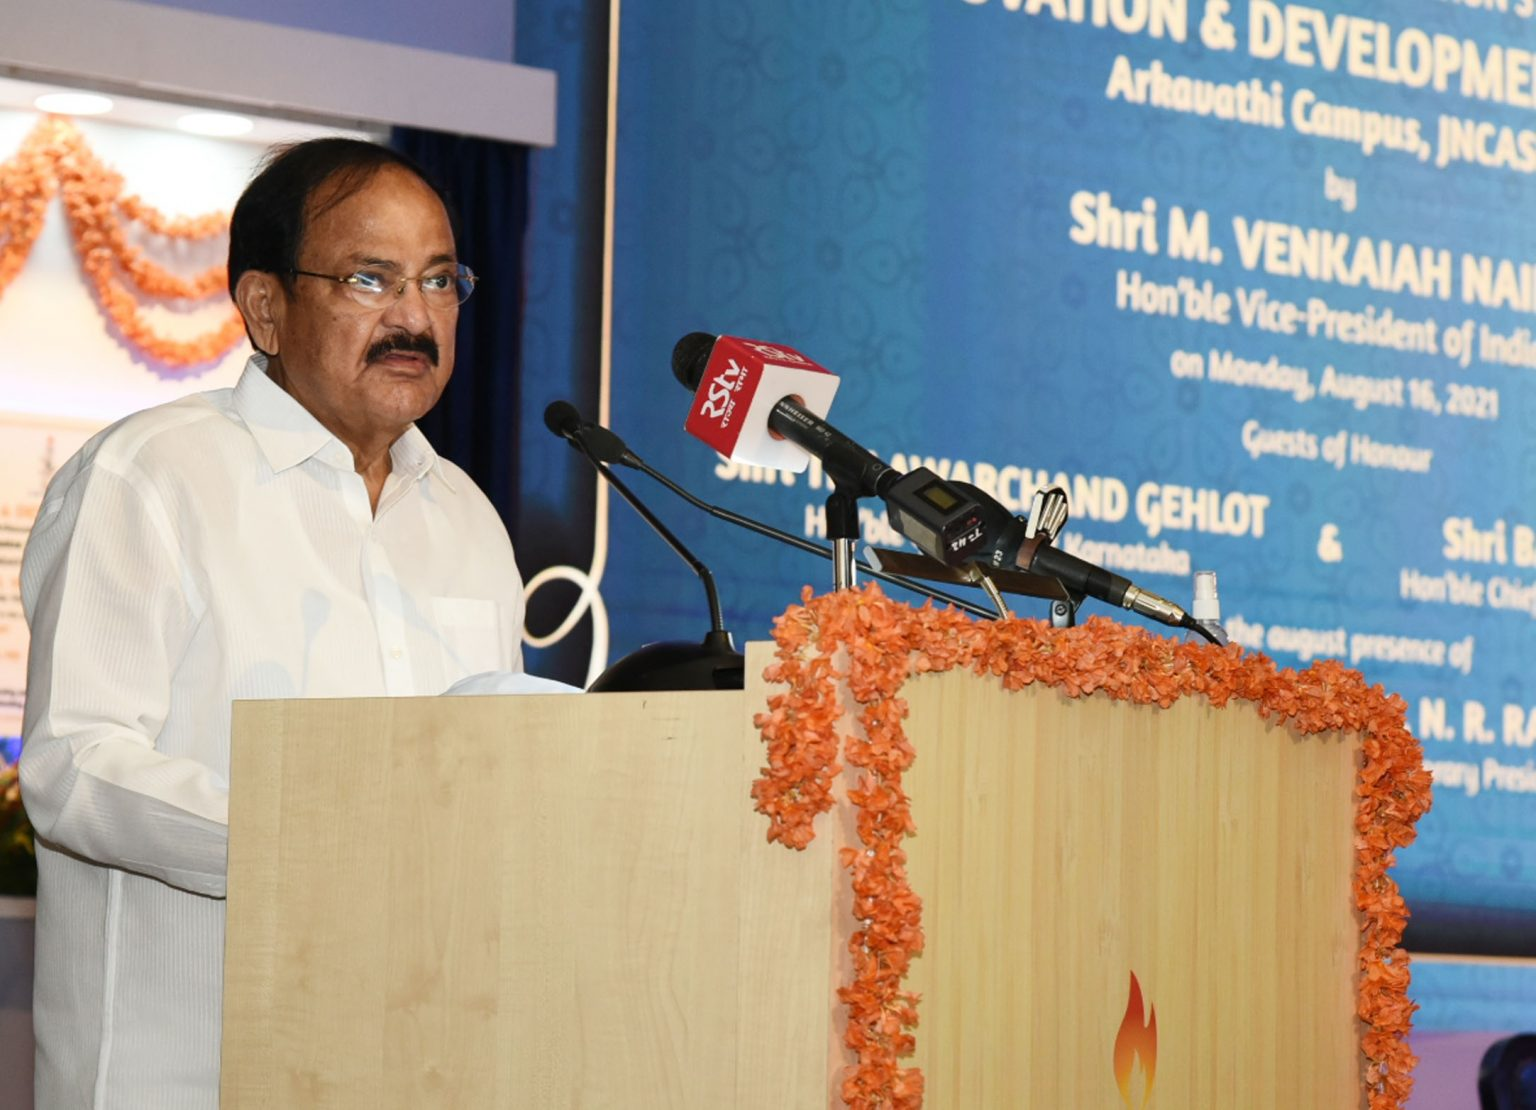 Venkaiah Naidu laid foundation stone of Innovation and Development Centre  _40.1